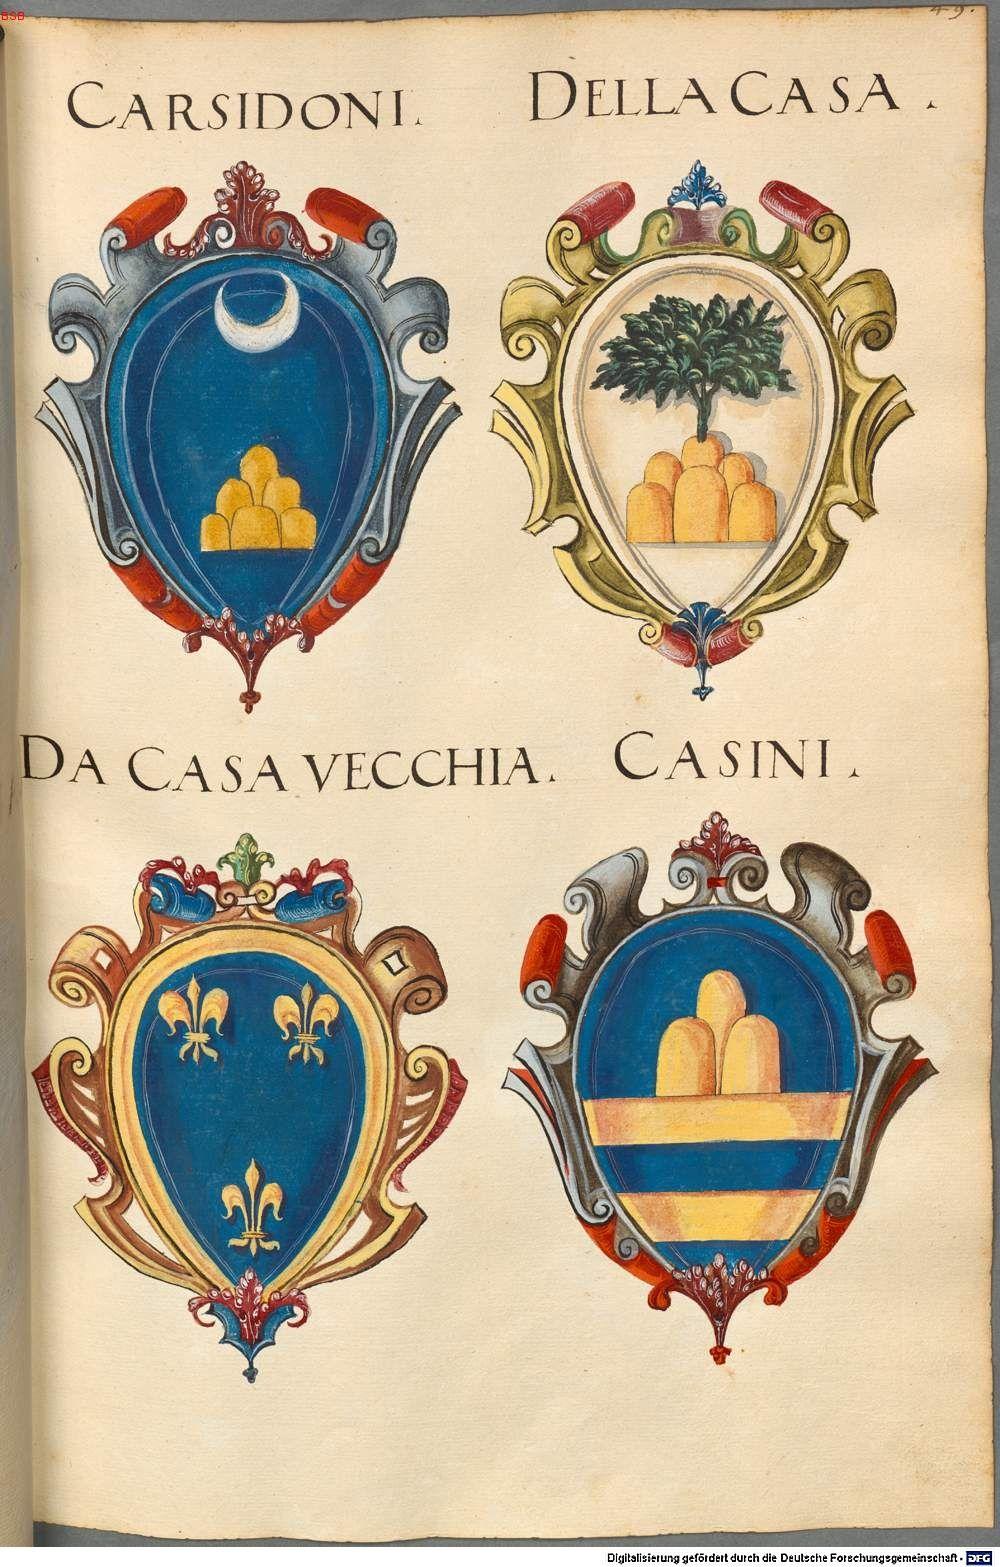 Insignia ... XII. Insignia Florentinorum - BSB Cod.icon. 277, [S.l.] Italien, 1550-1555 [BSB-Hss Cod.icon. 277]